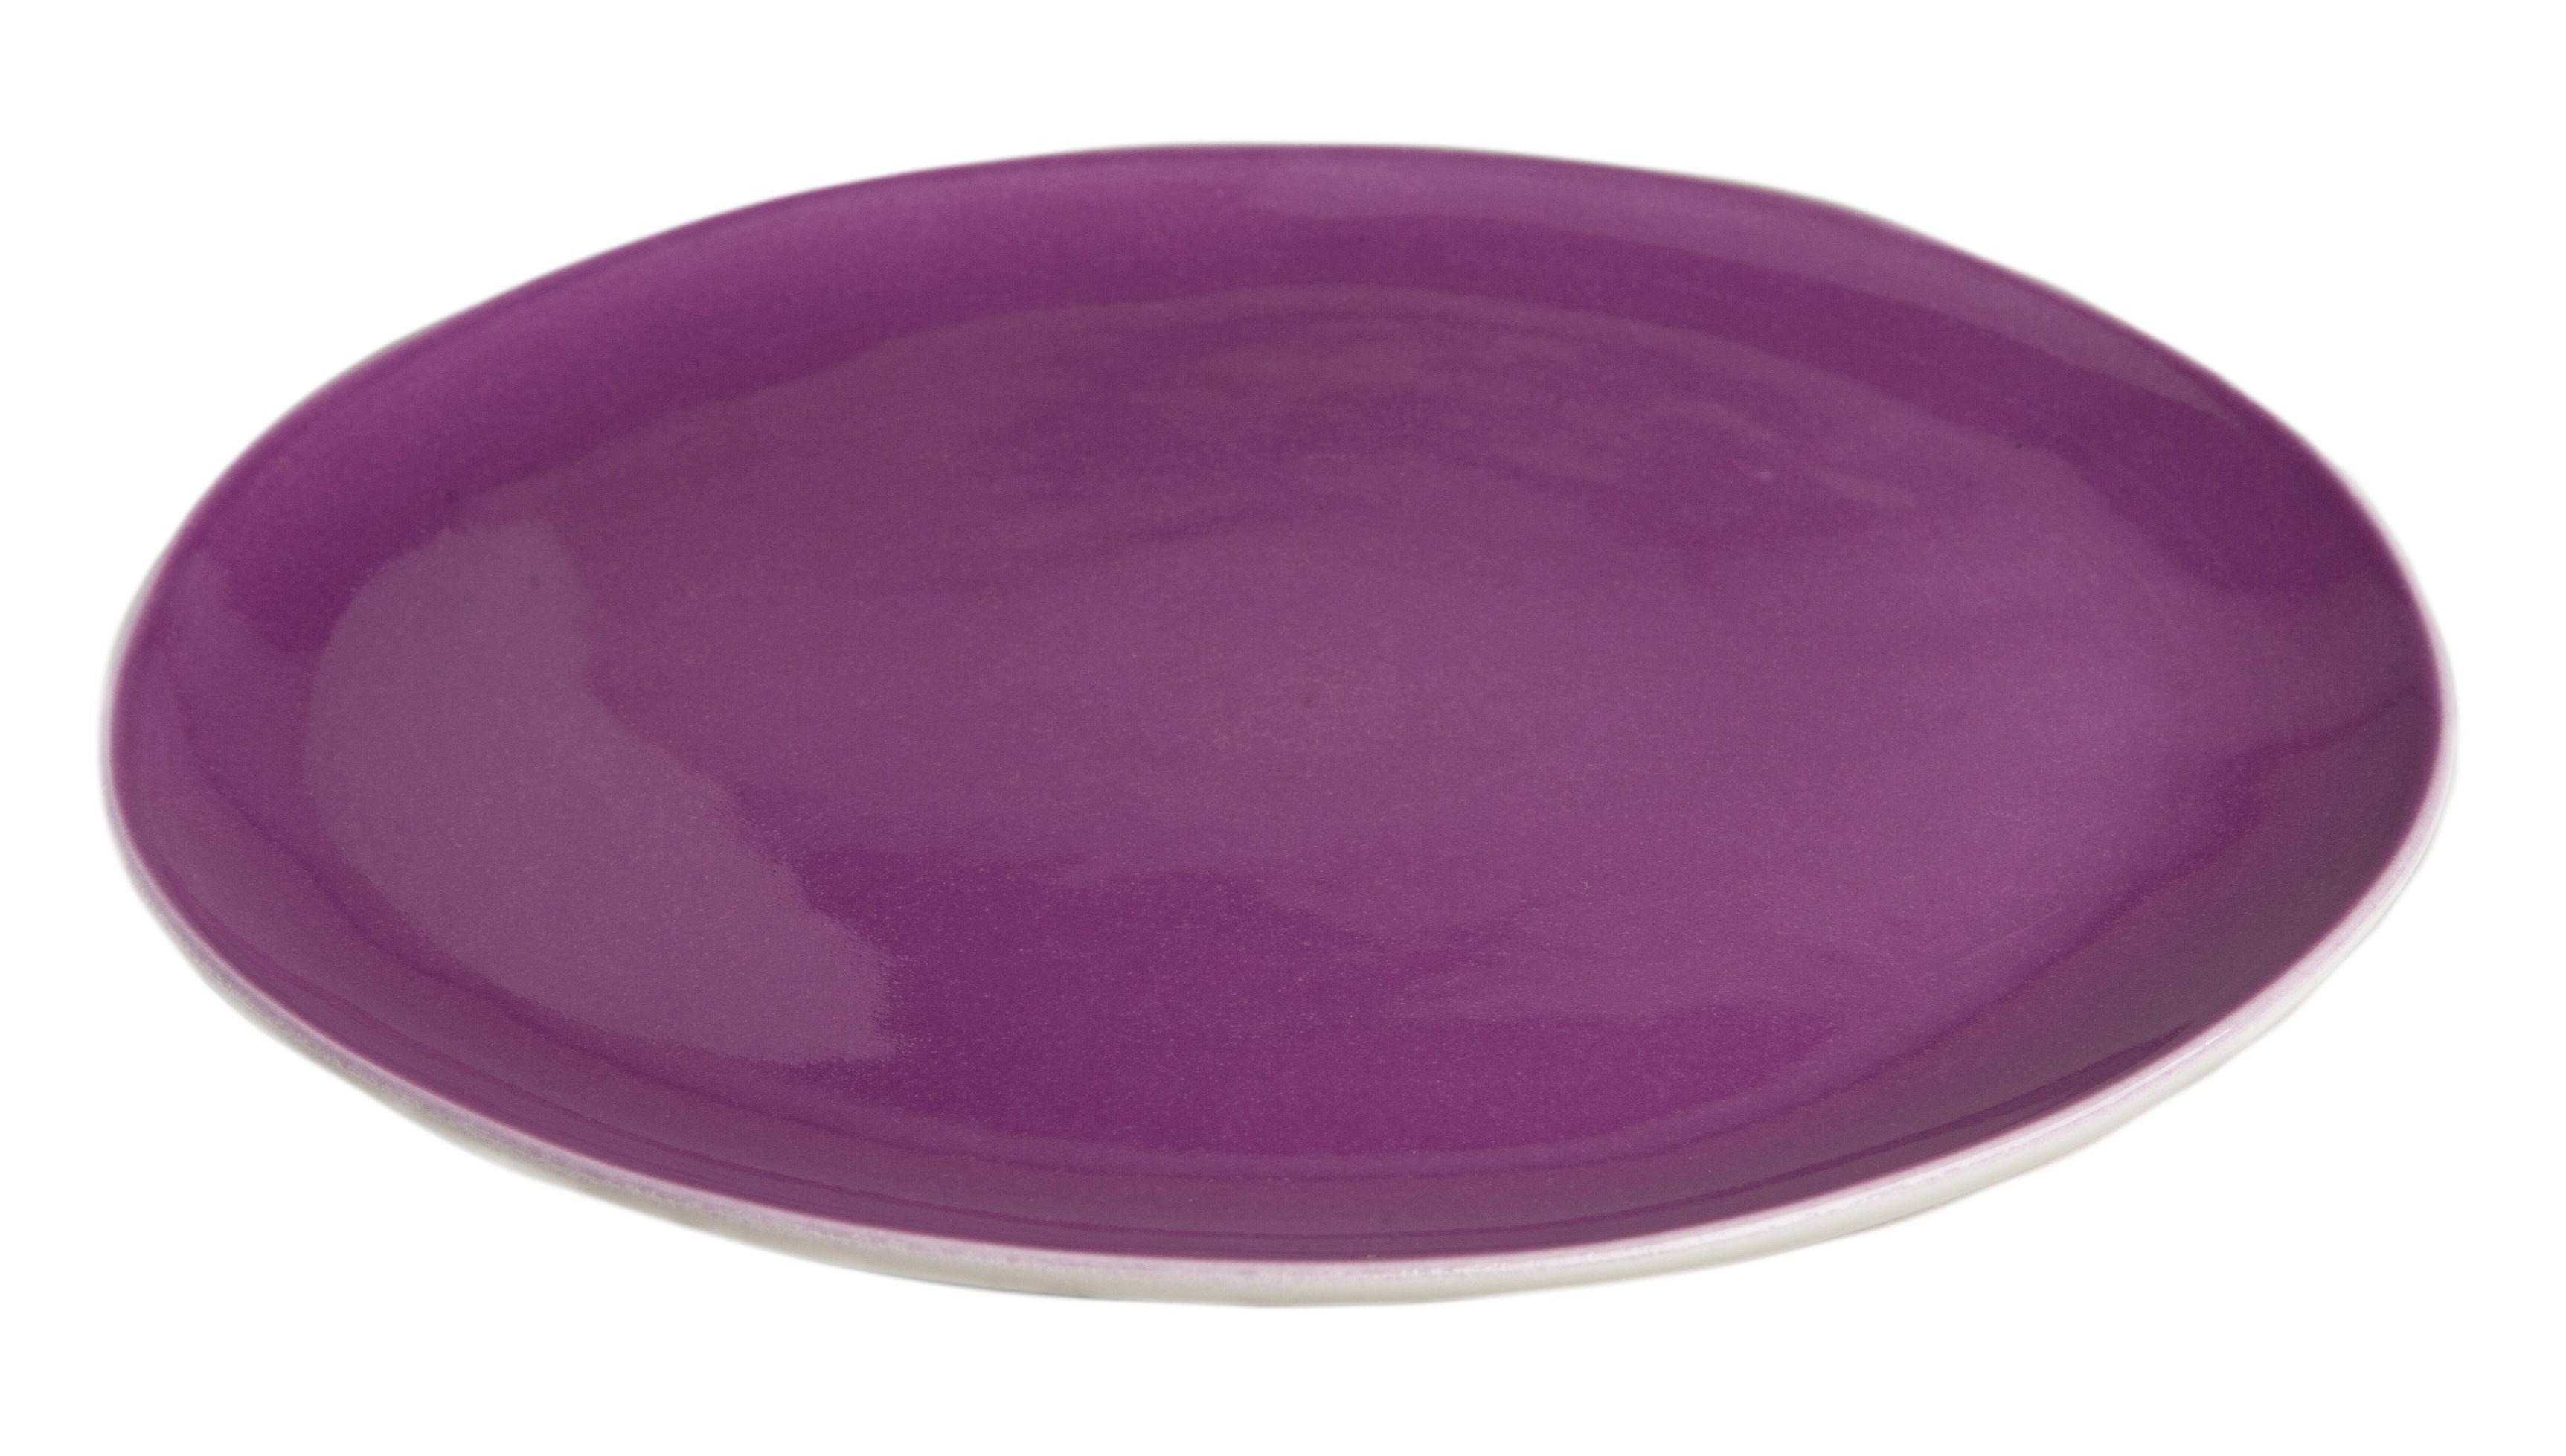 Tischkultur - Teller - Bazelaire Teller Ø 26 cm - emaillierte Fayence-Keramik - Sentou Edition - Violett - emaillierte Fayence